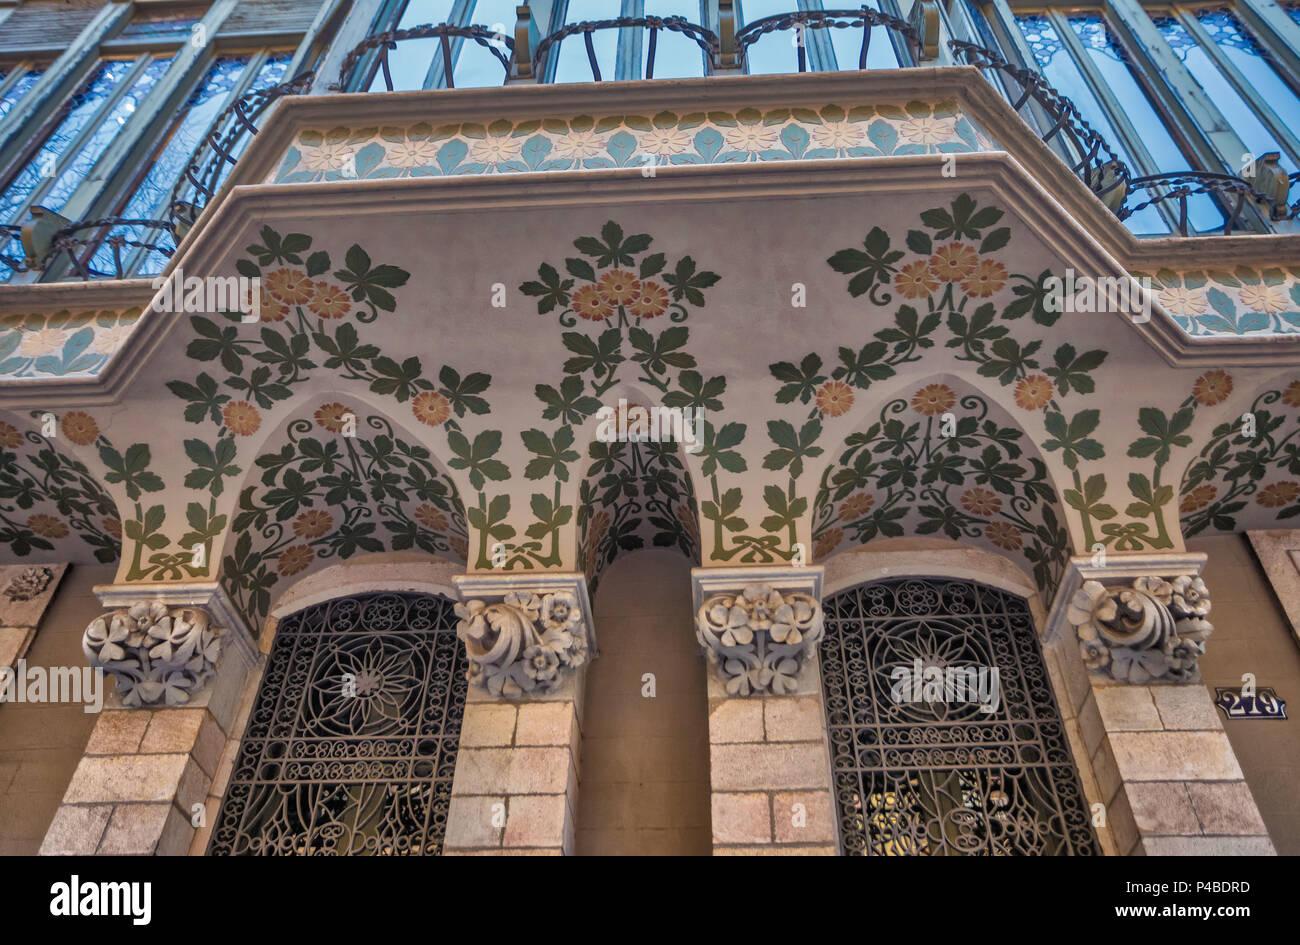 balcony detail, Barcelona City, Modernism architecture, Spain - Stock Image